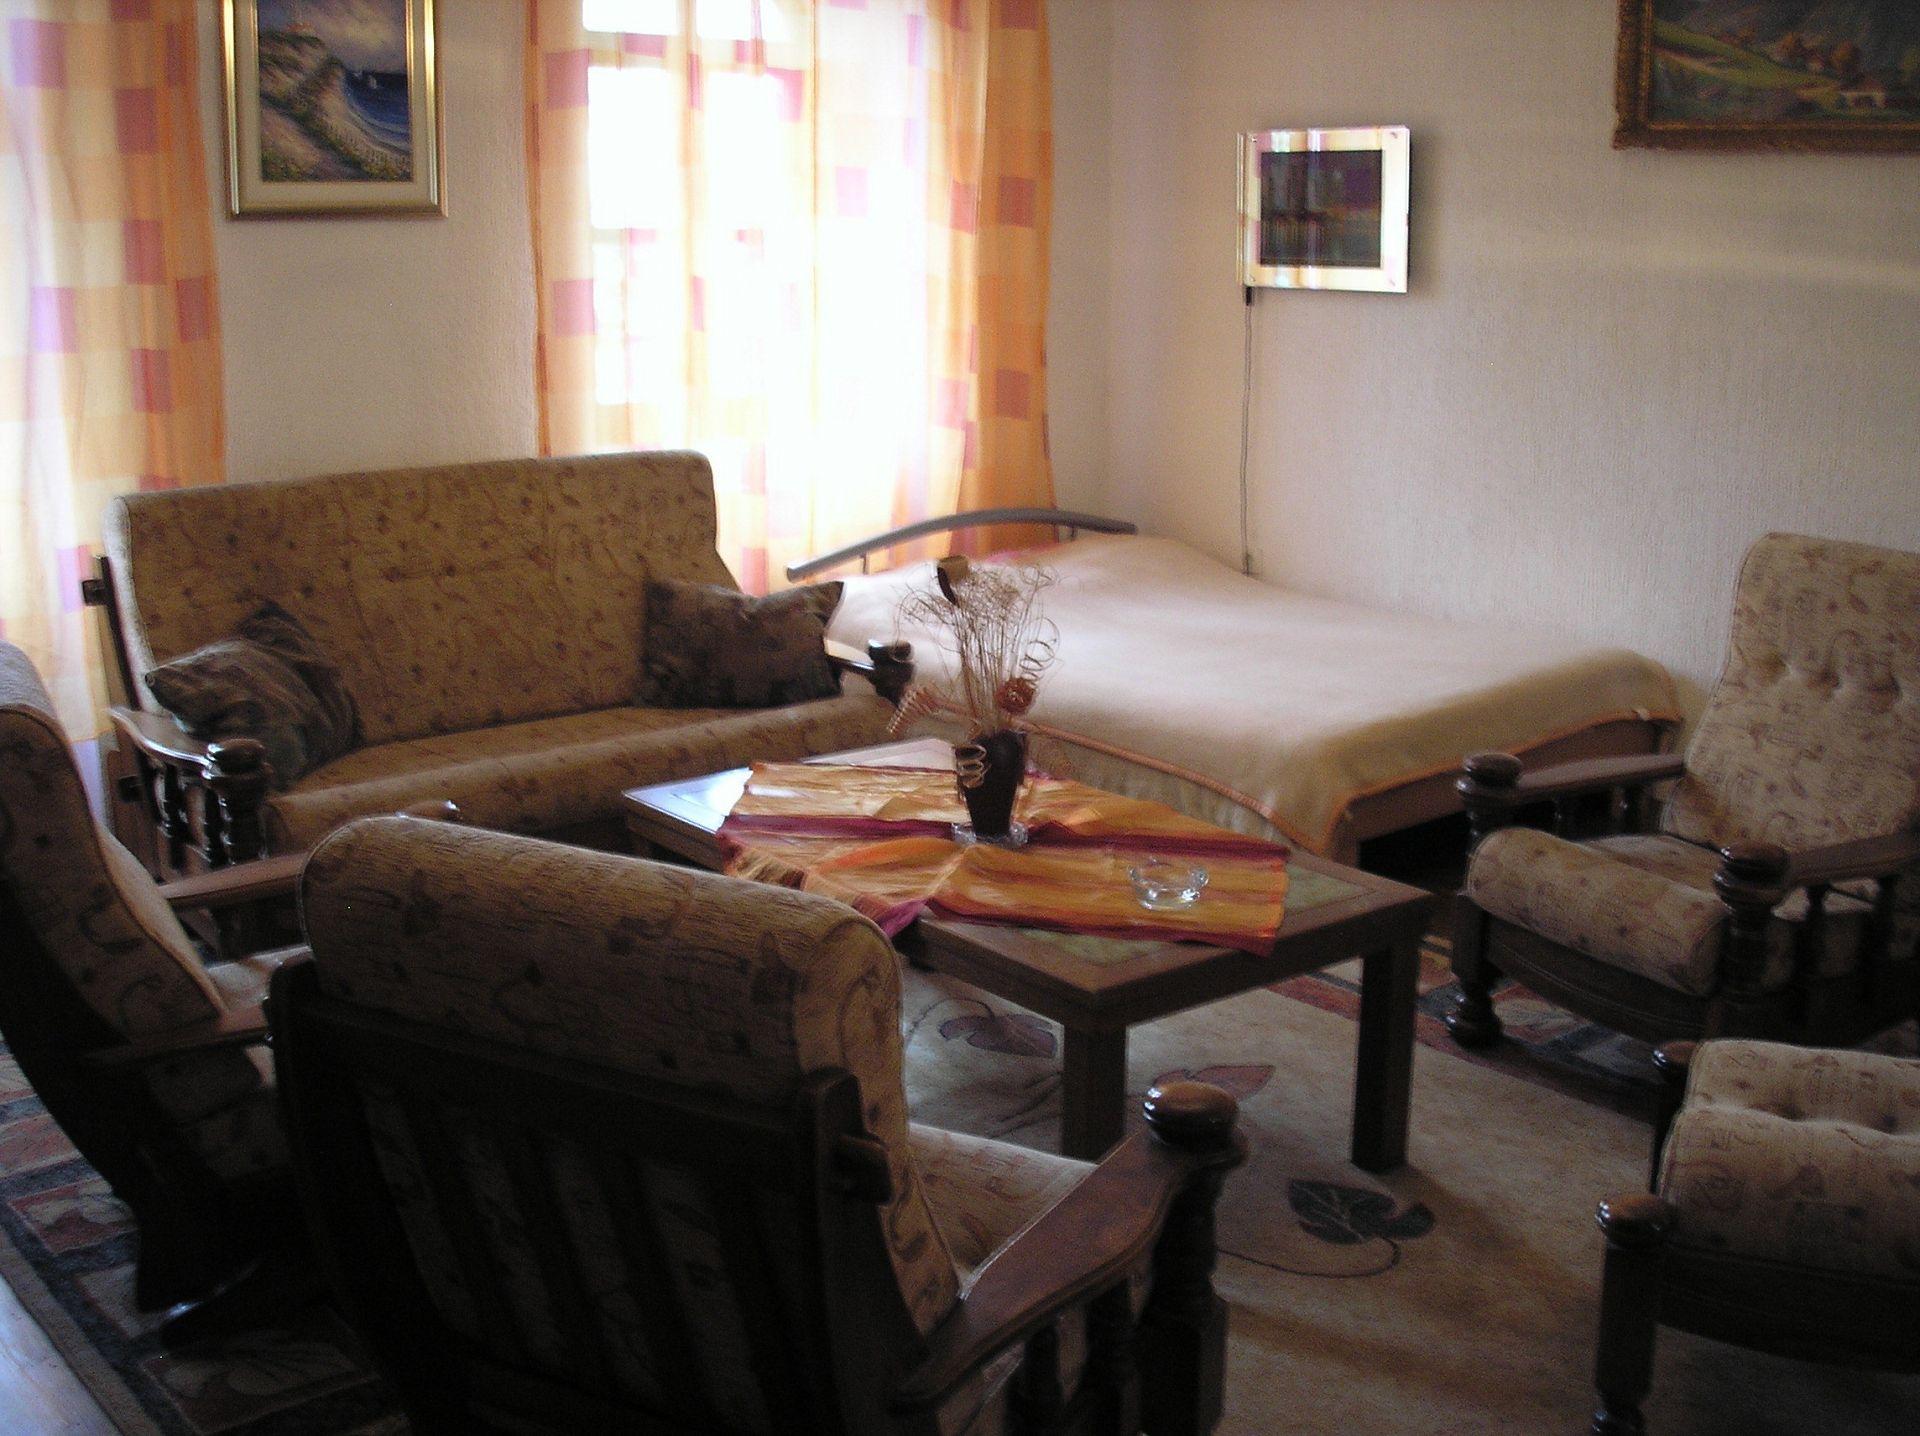 Apartment Room Zvonkic R2 Aljmas, Continental Croatia 51945, Aljmaš, , Osjecko Baranjska